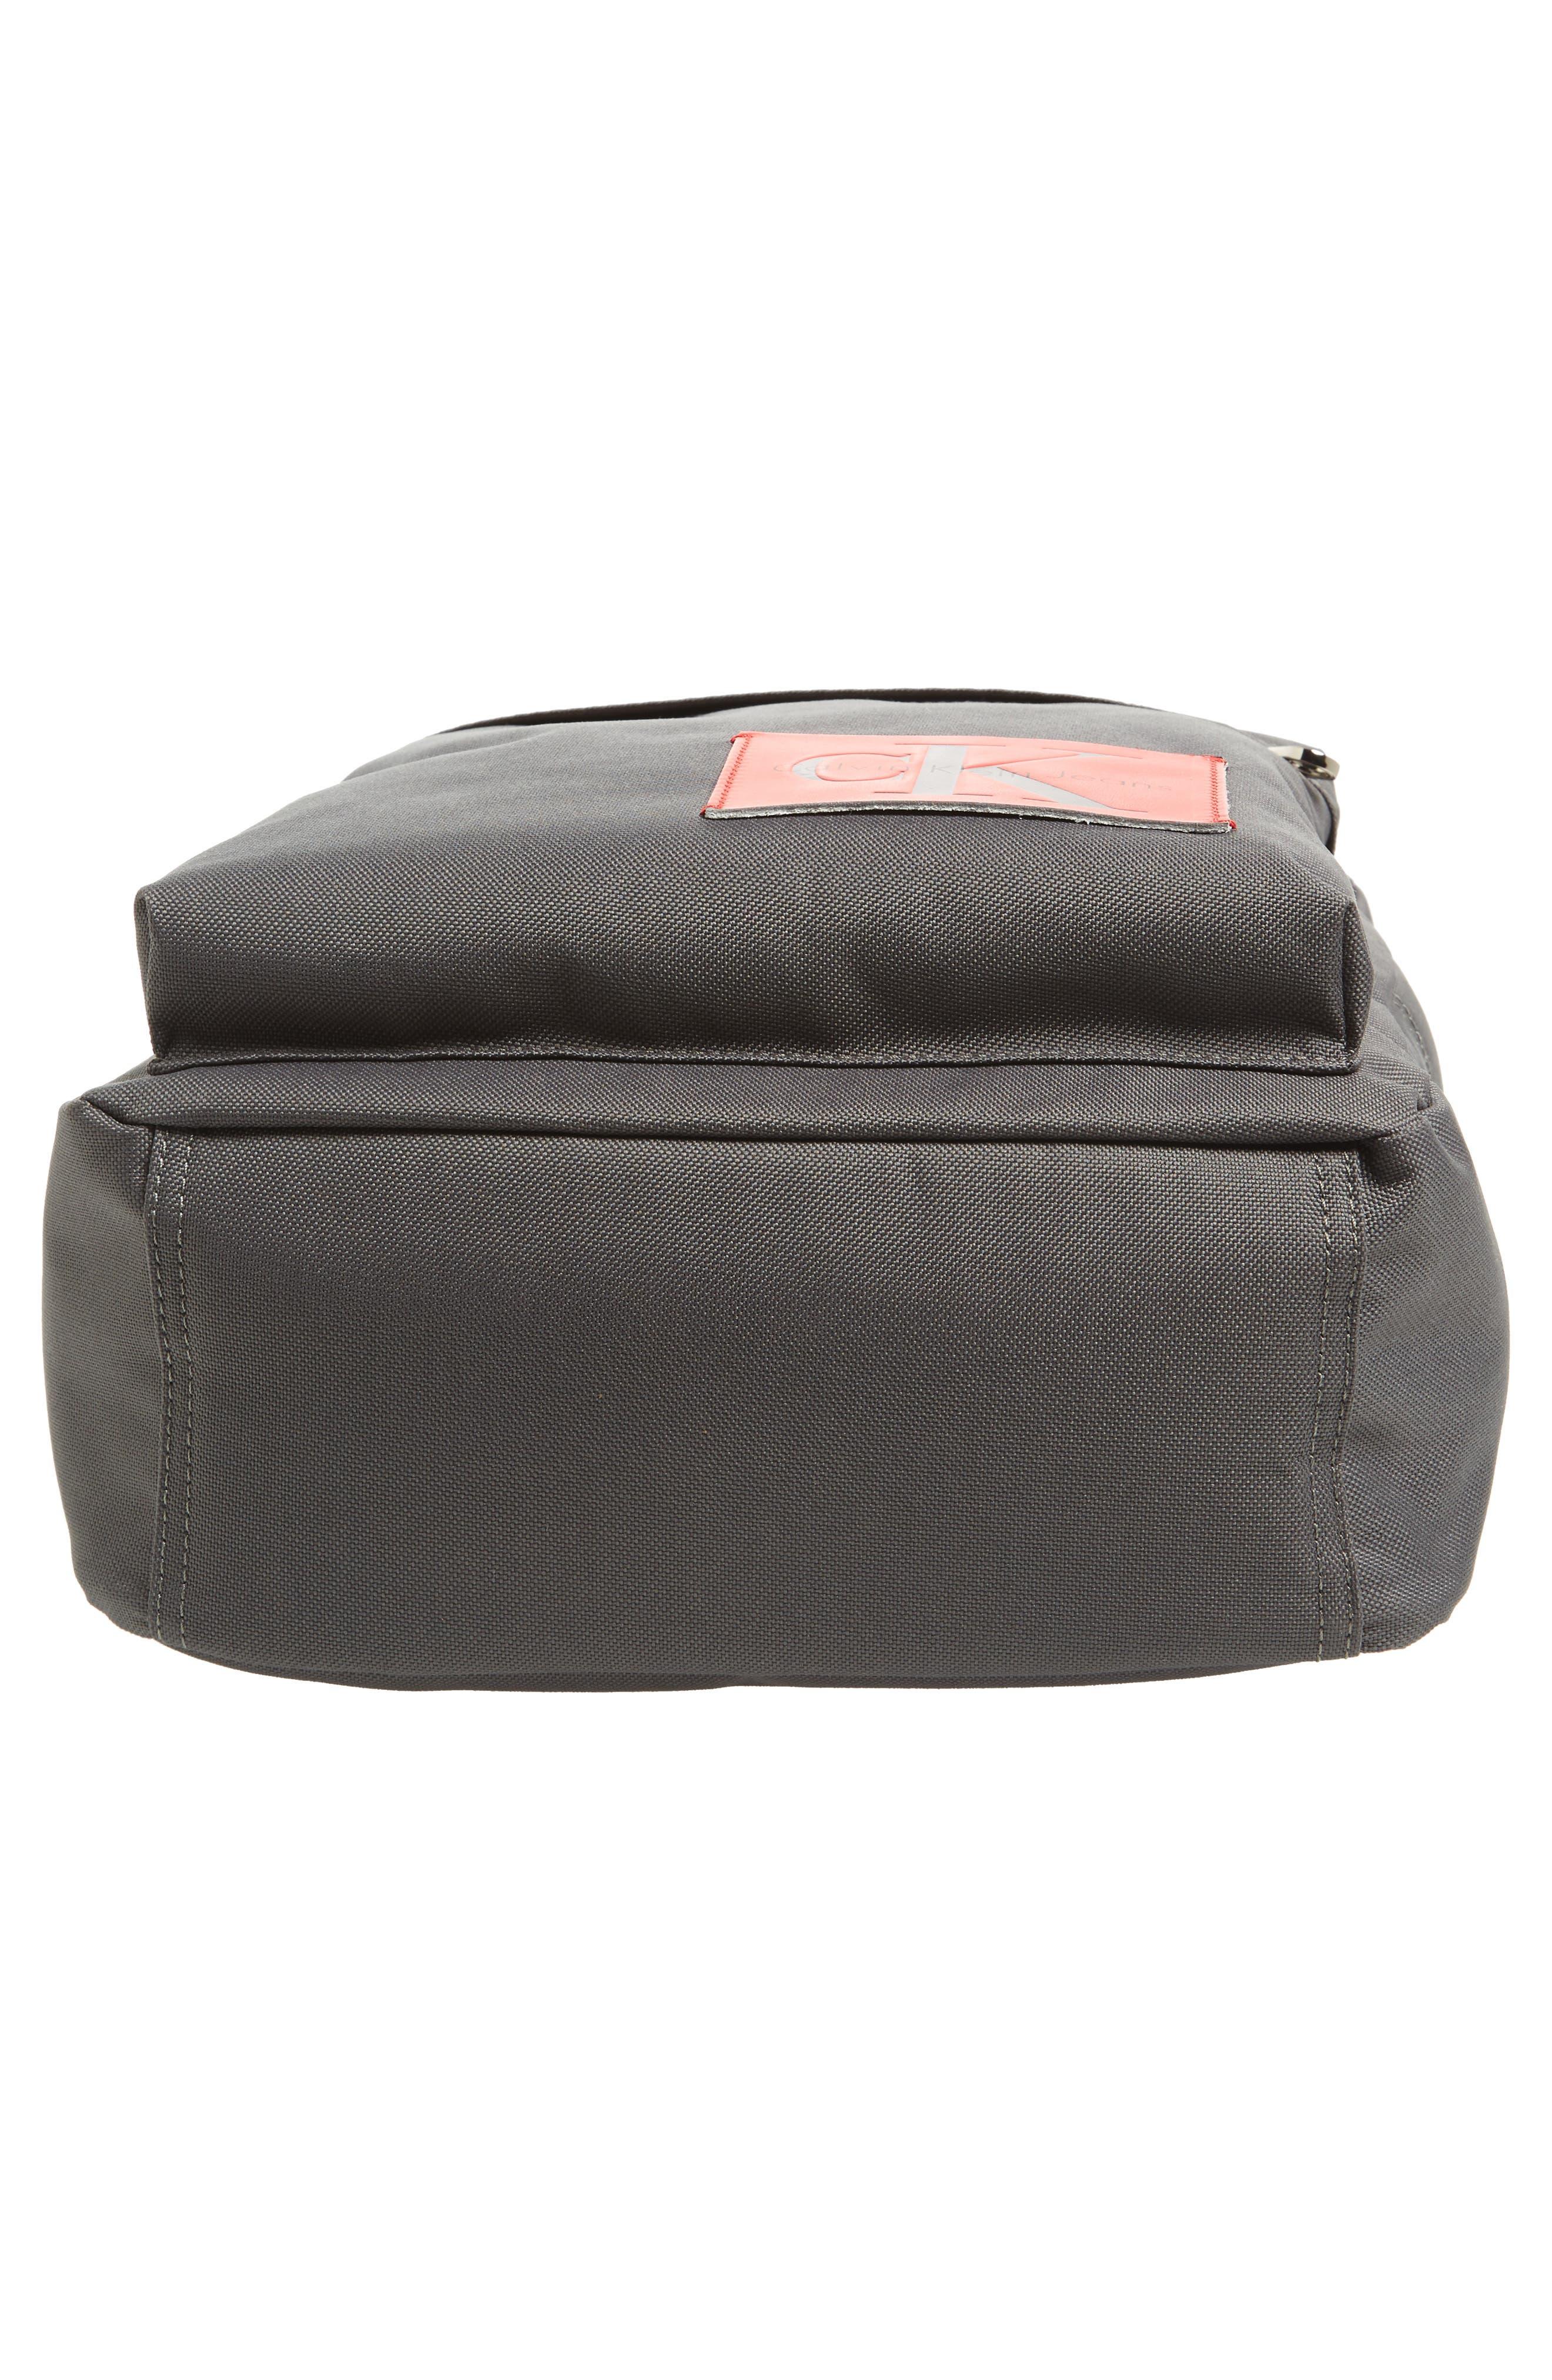 Slim Square Backpack,                             Alternate thumbnail 6, color,                             Charcoal